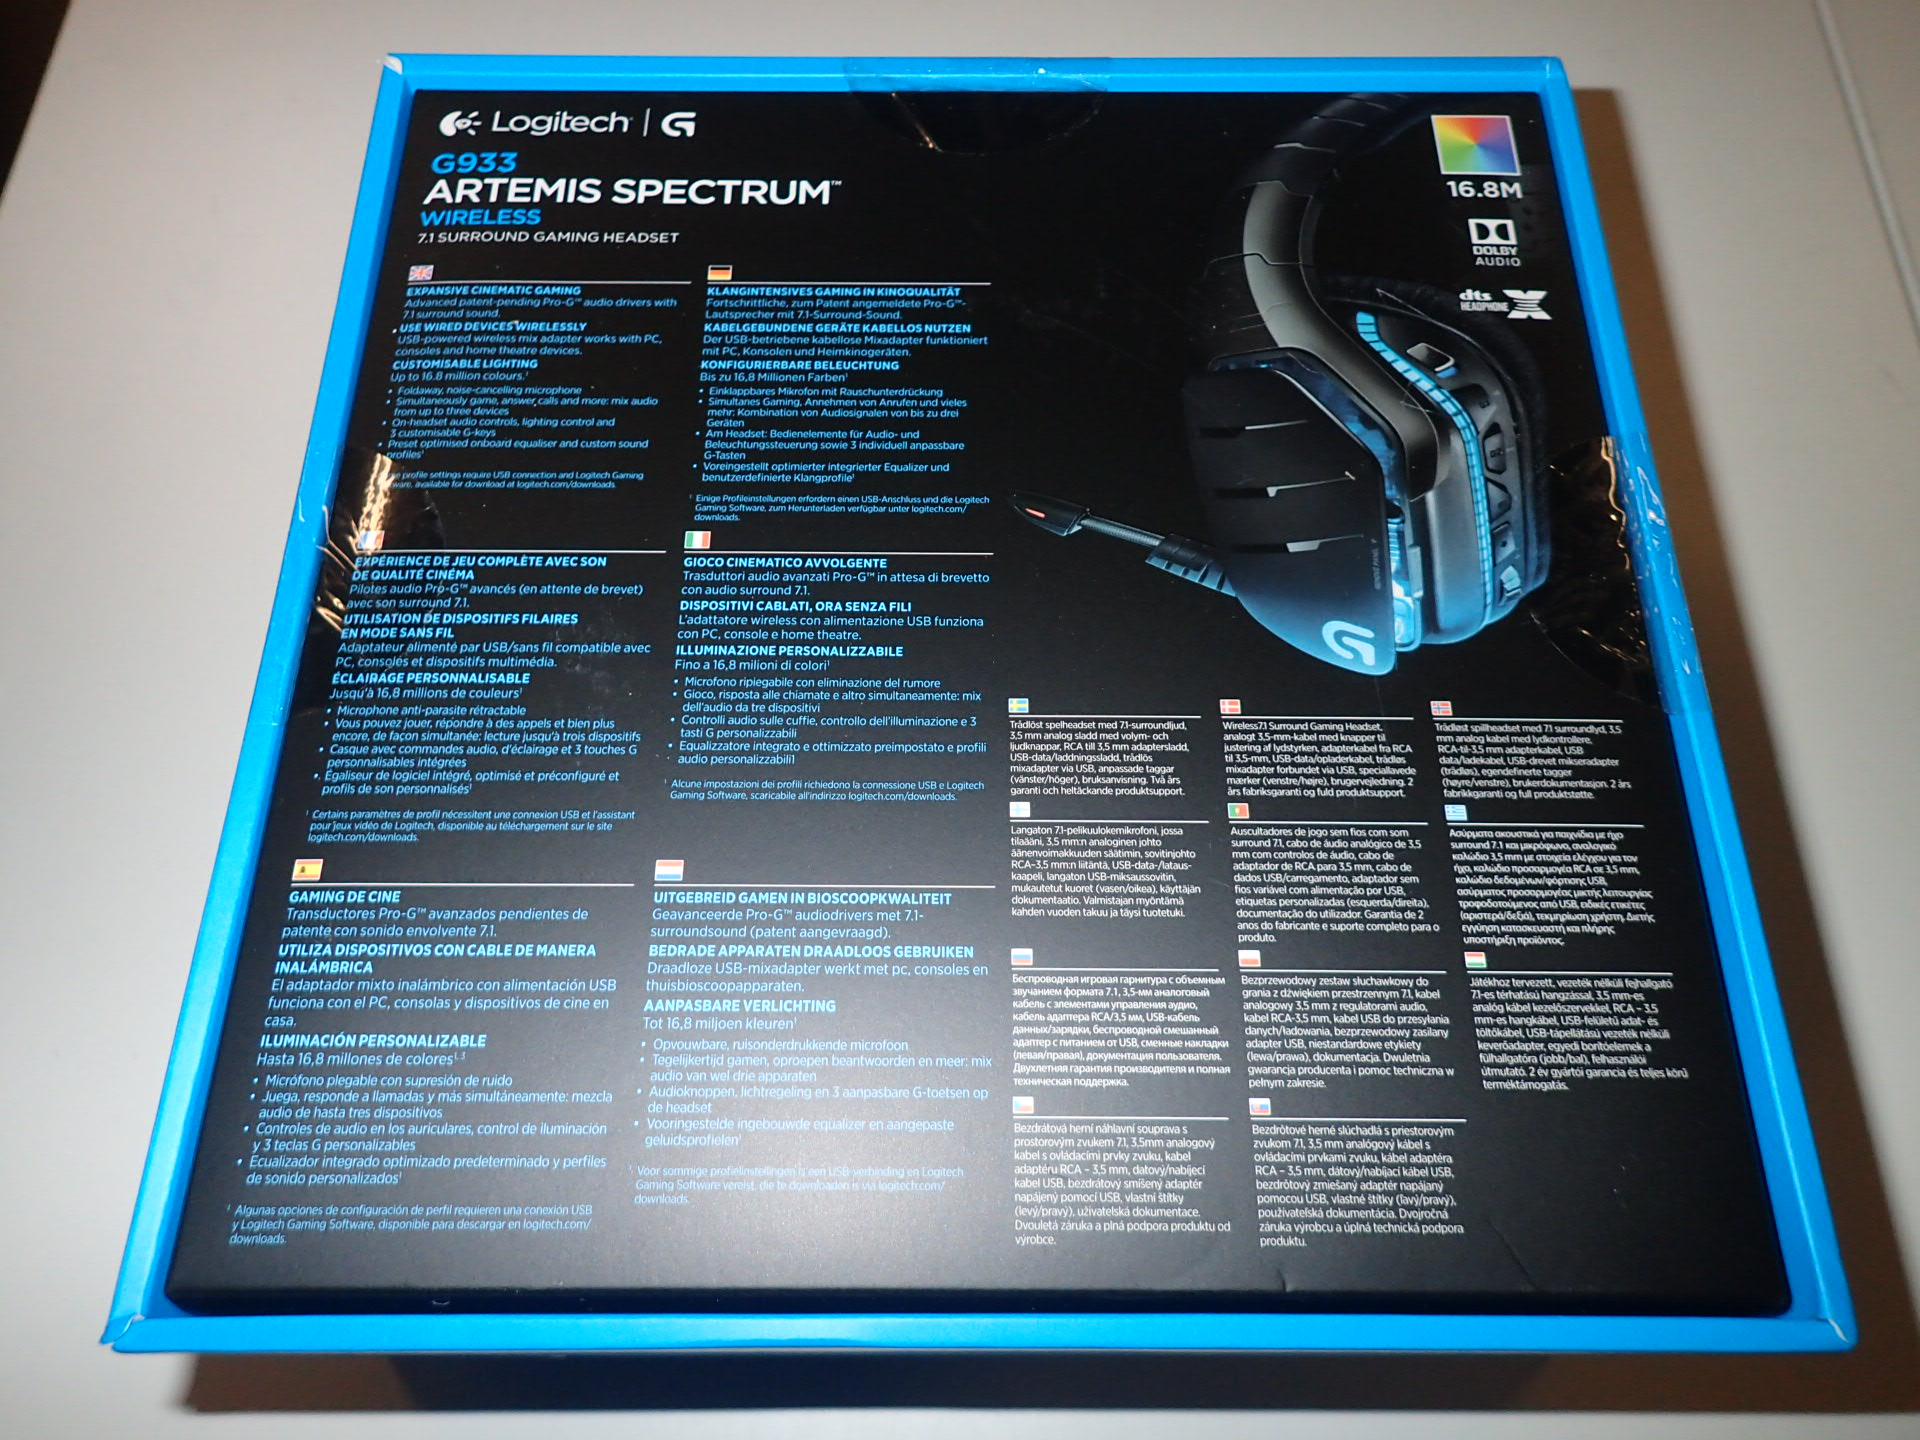 New Logitech G933 Artemis Spectrum Gaming Headset - PS Auction